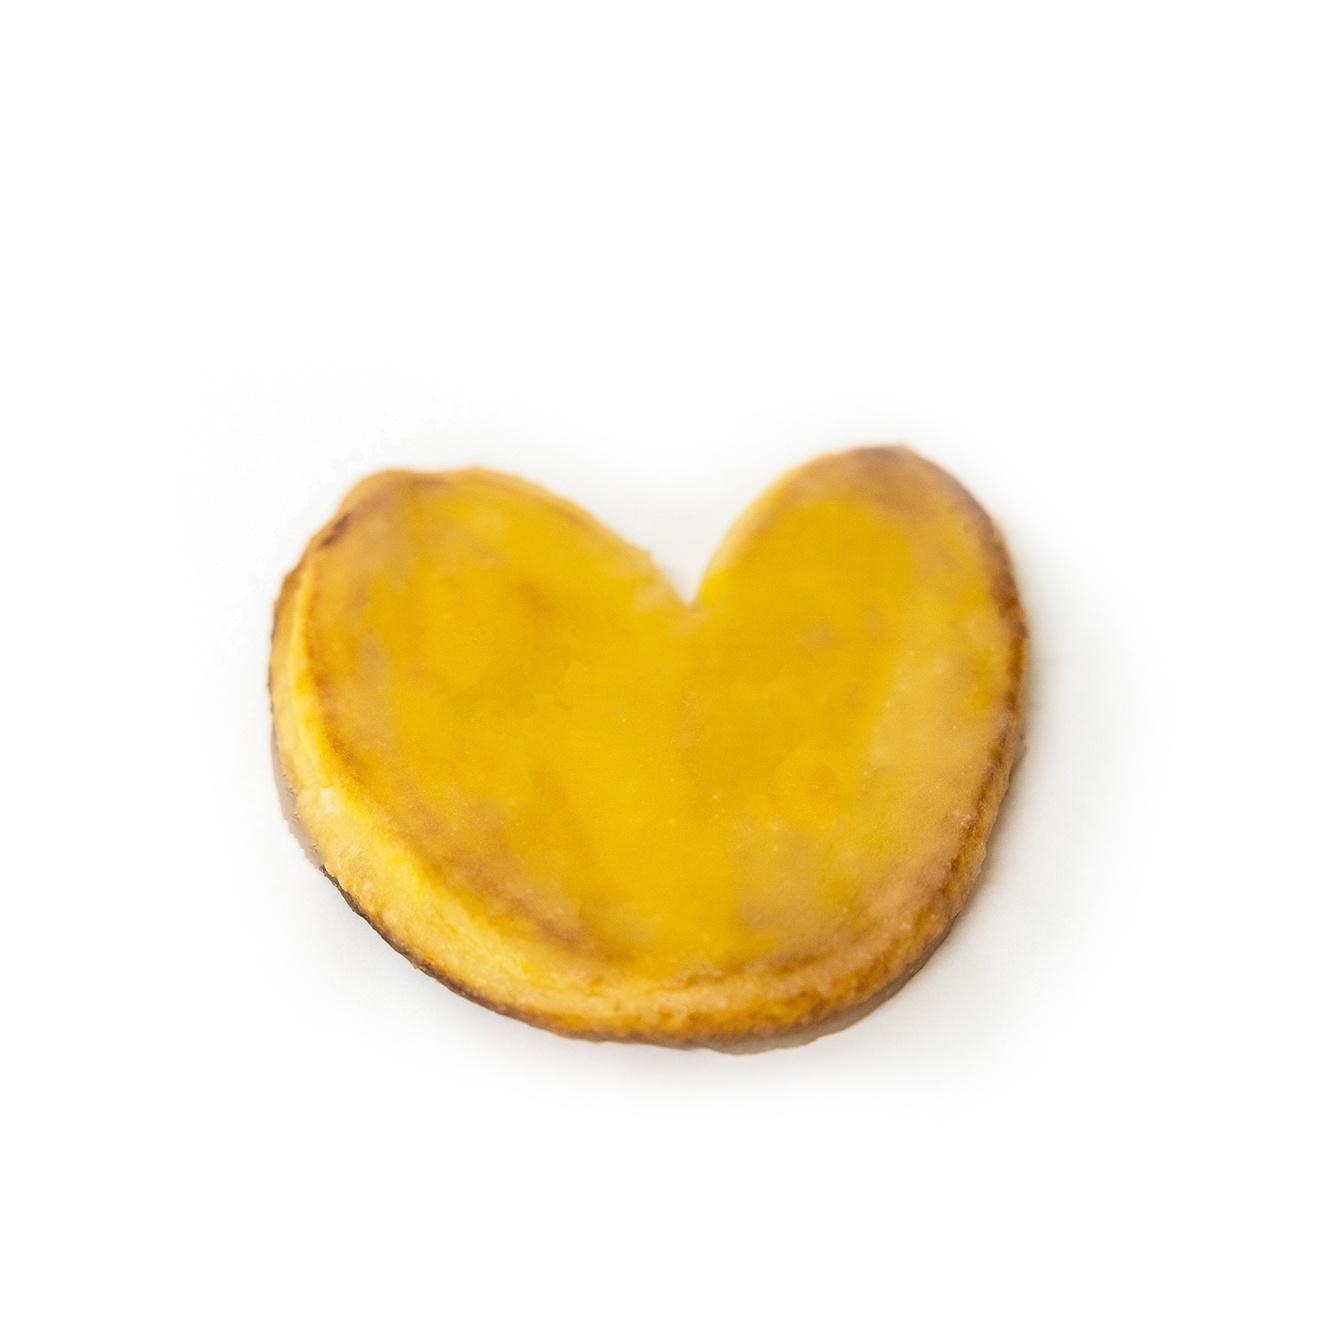 palmier-coberto-pastelaria-fresca-entrega-casa-cale-confeitaria-tradicional-portuguesa-peniche-caldas-rainha-padaria-pastelaria